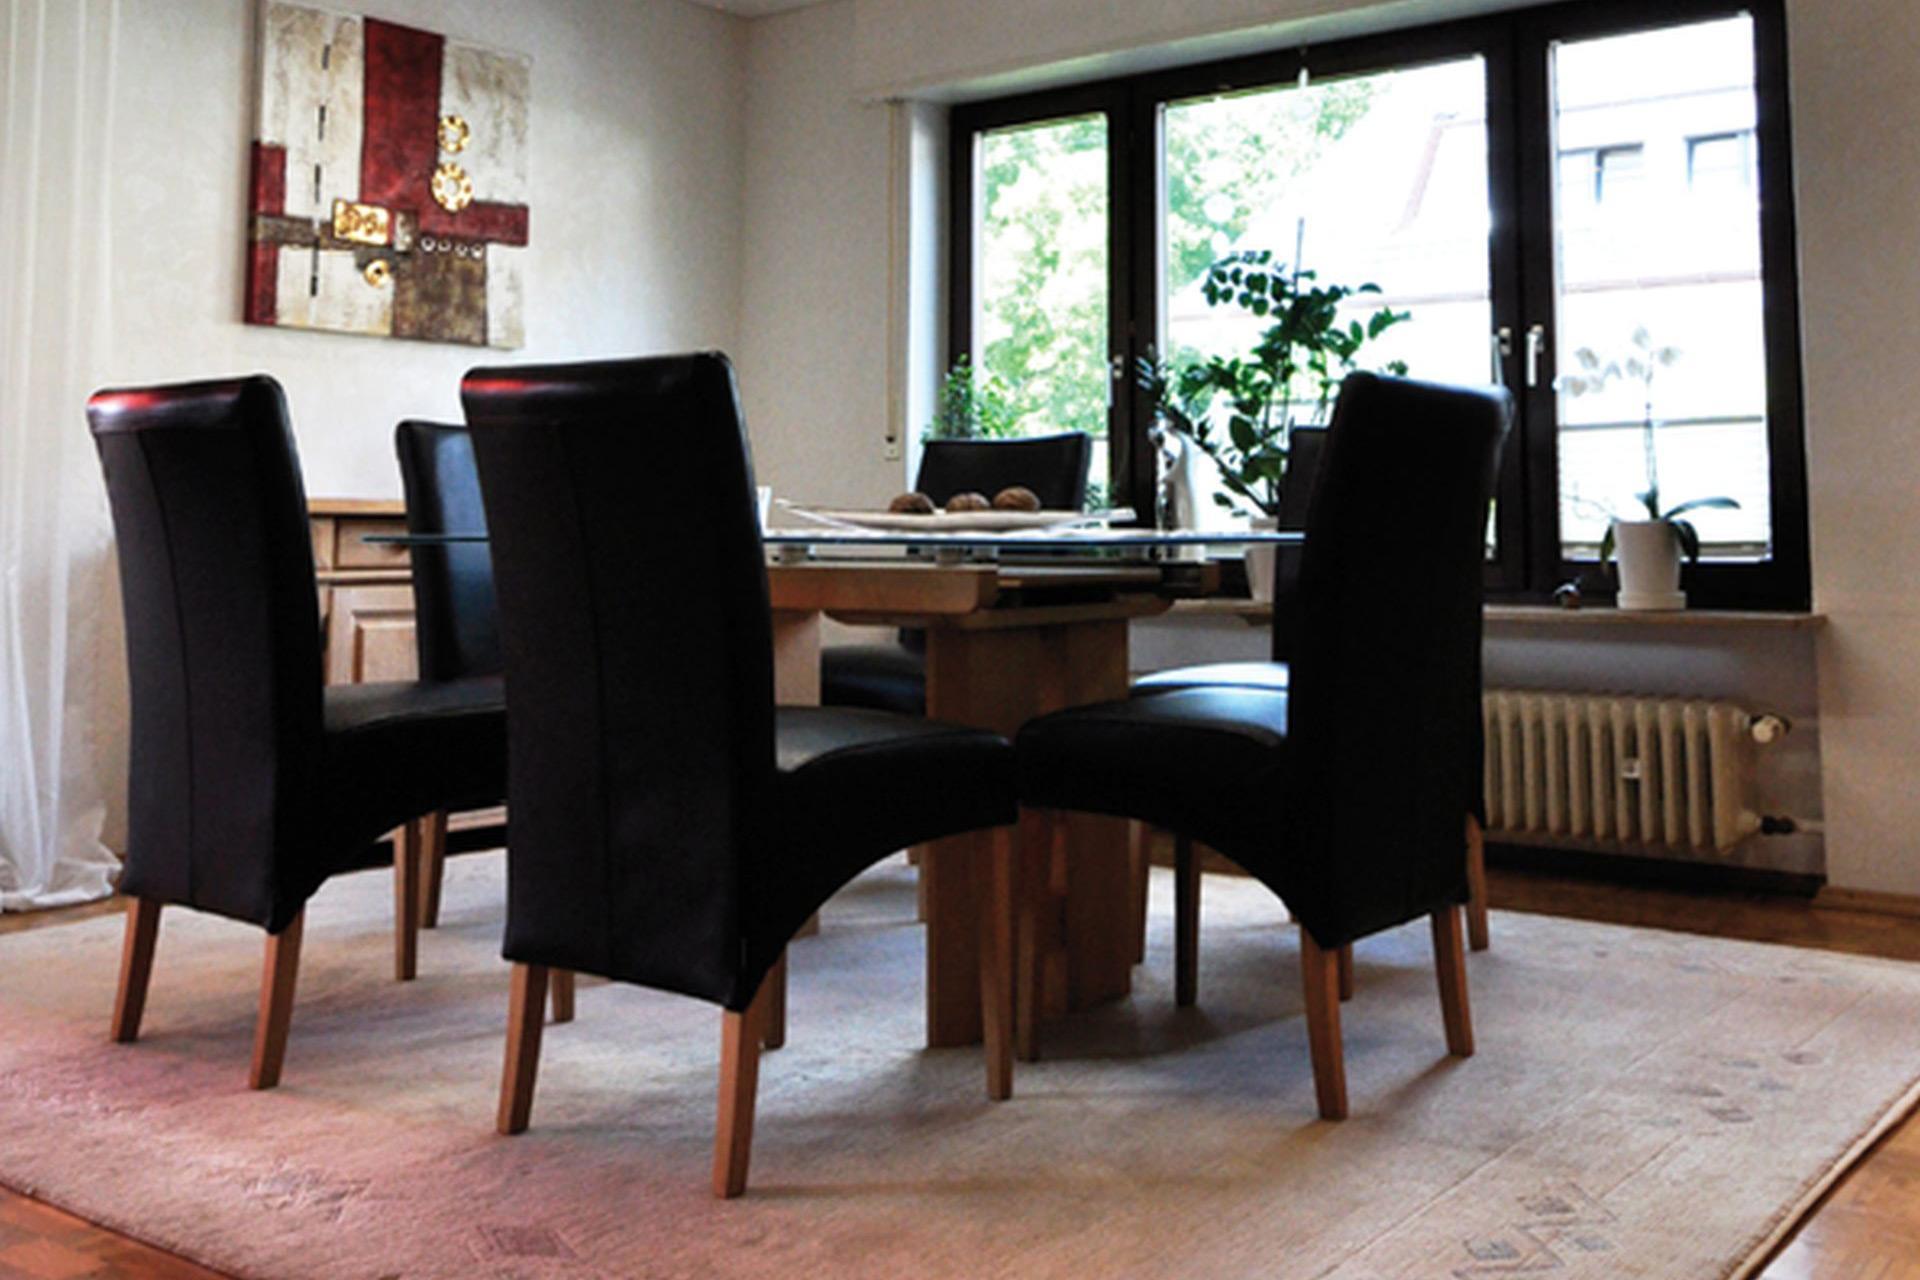 projekt esszimmer tischlerei krug. Black Bedroom Furniture Sets. Home Design Ideas